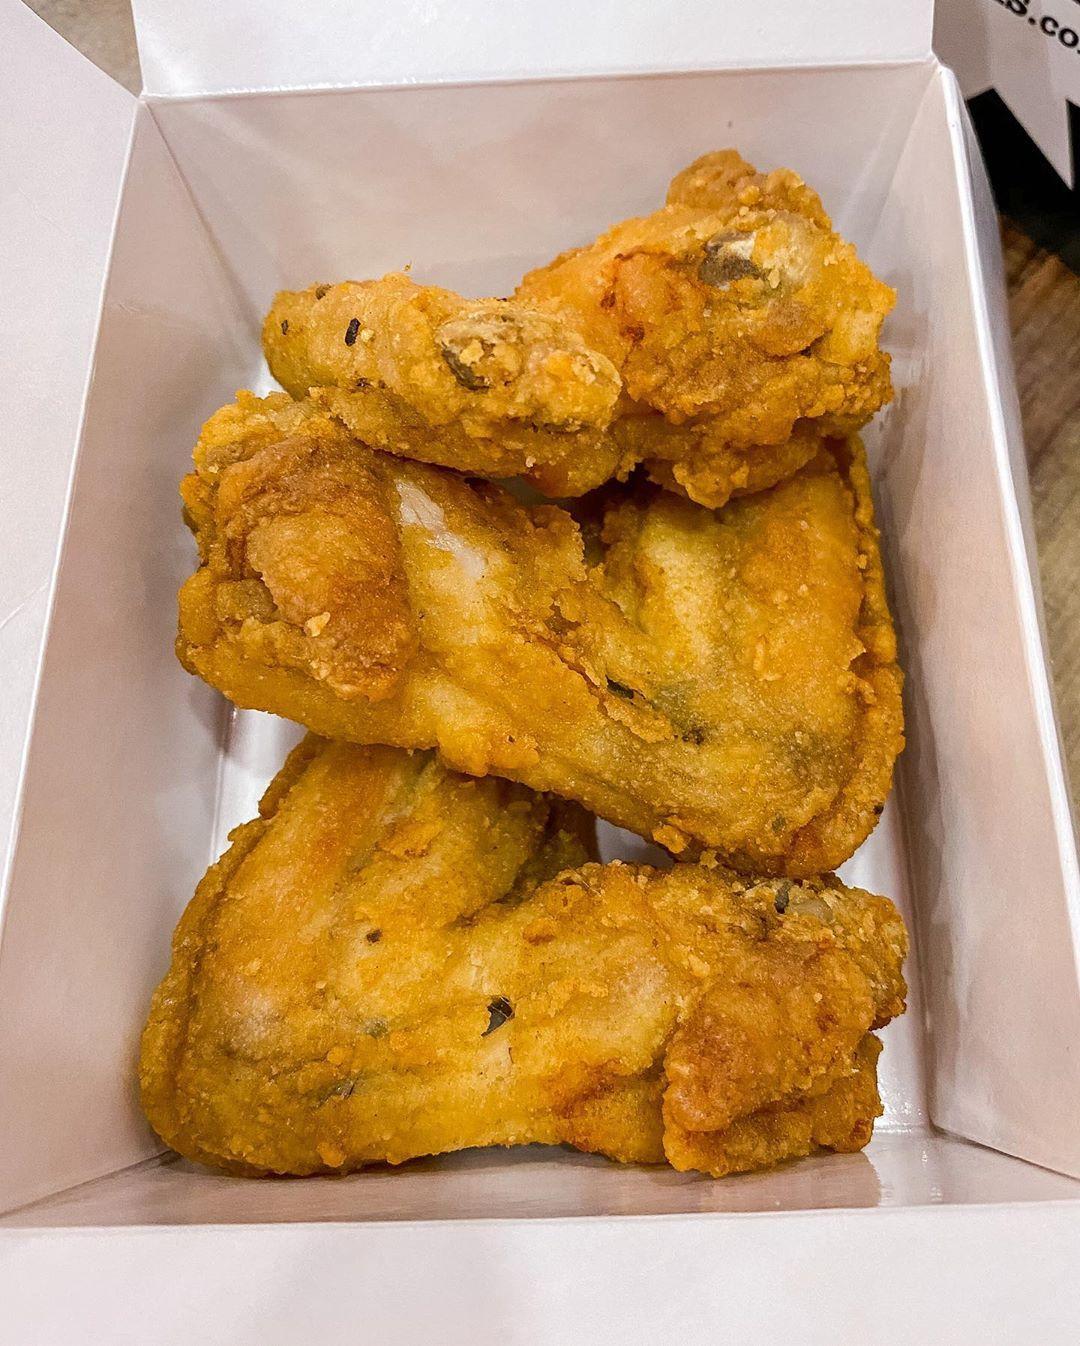 Jaqks Chicken Chips Halal Original Jumbo Wings Jaqkschickenandchips Birmingham Bham Jaqks Takeaway Friedc In 2020 Chicken And Chips Halal Recipes Foodie